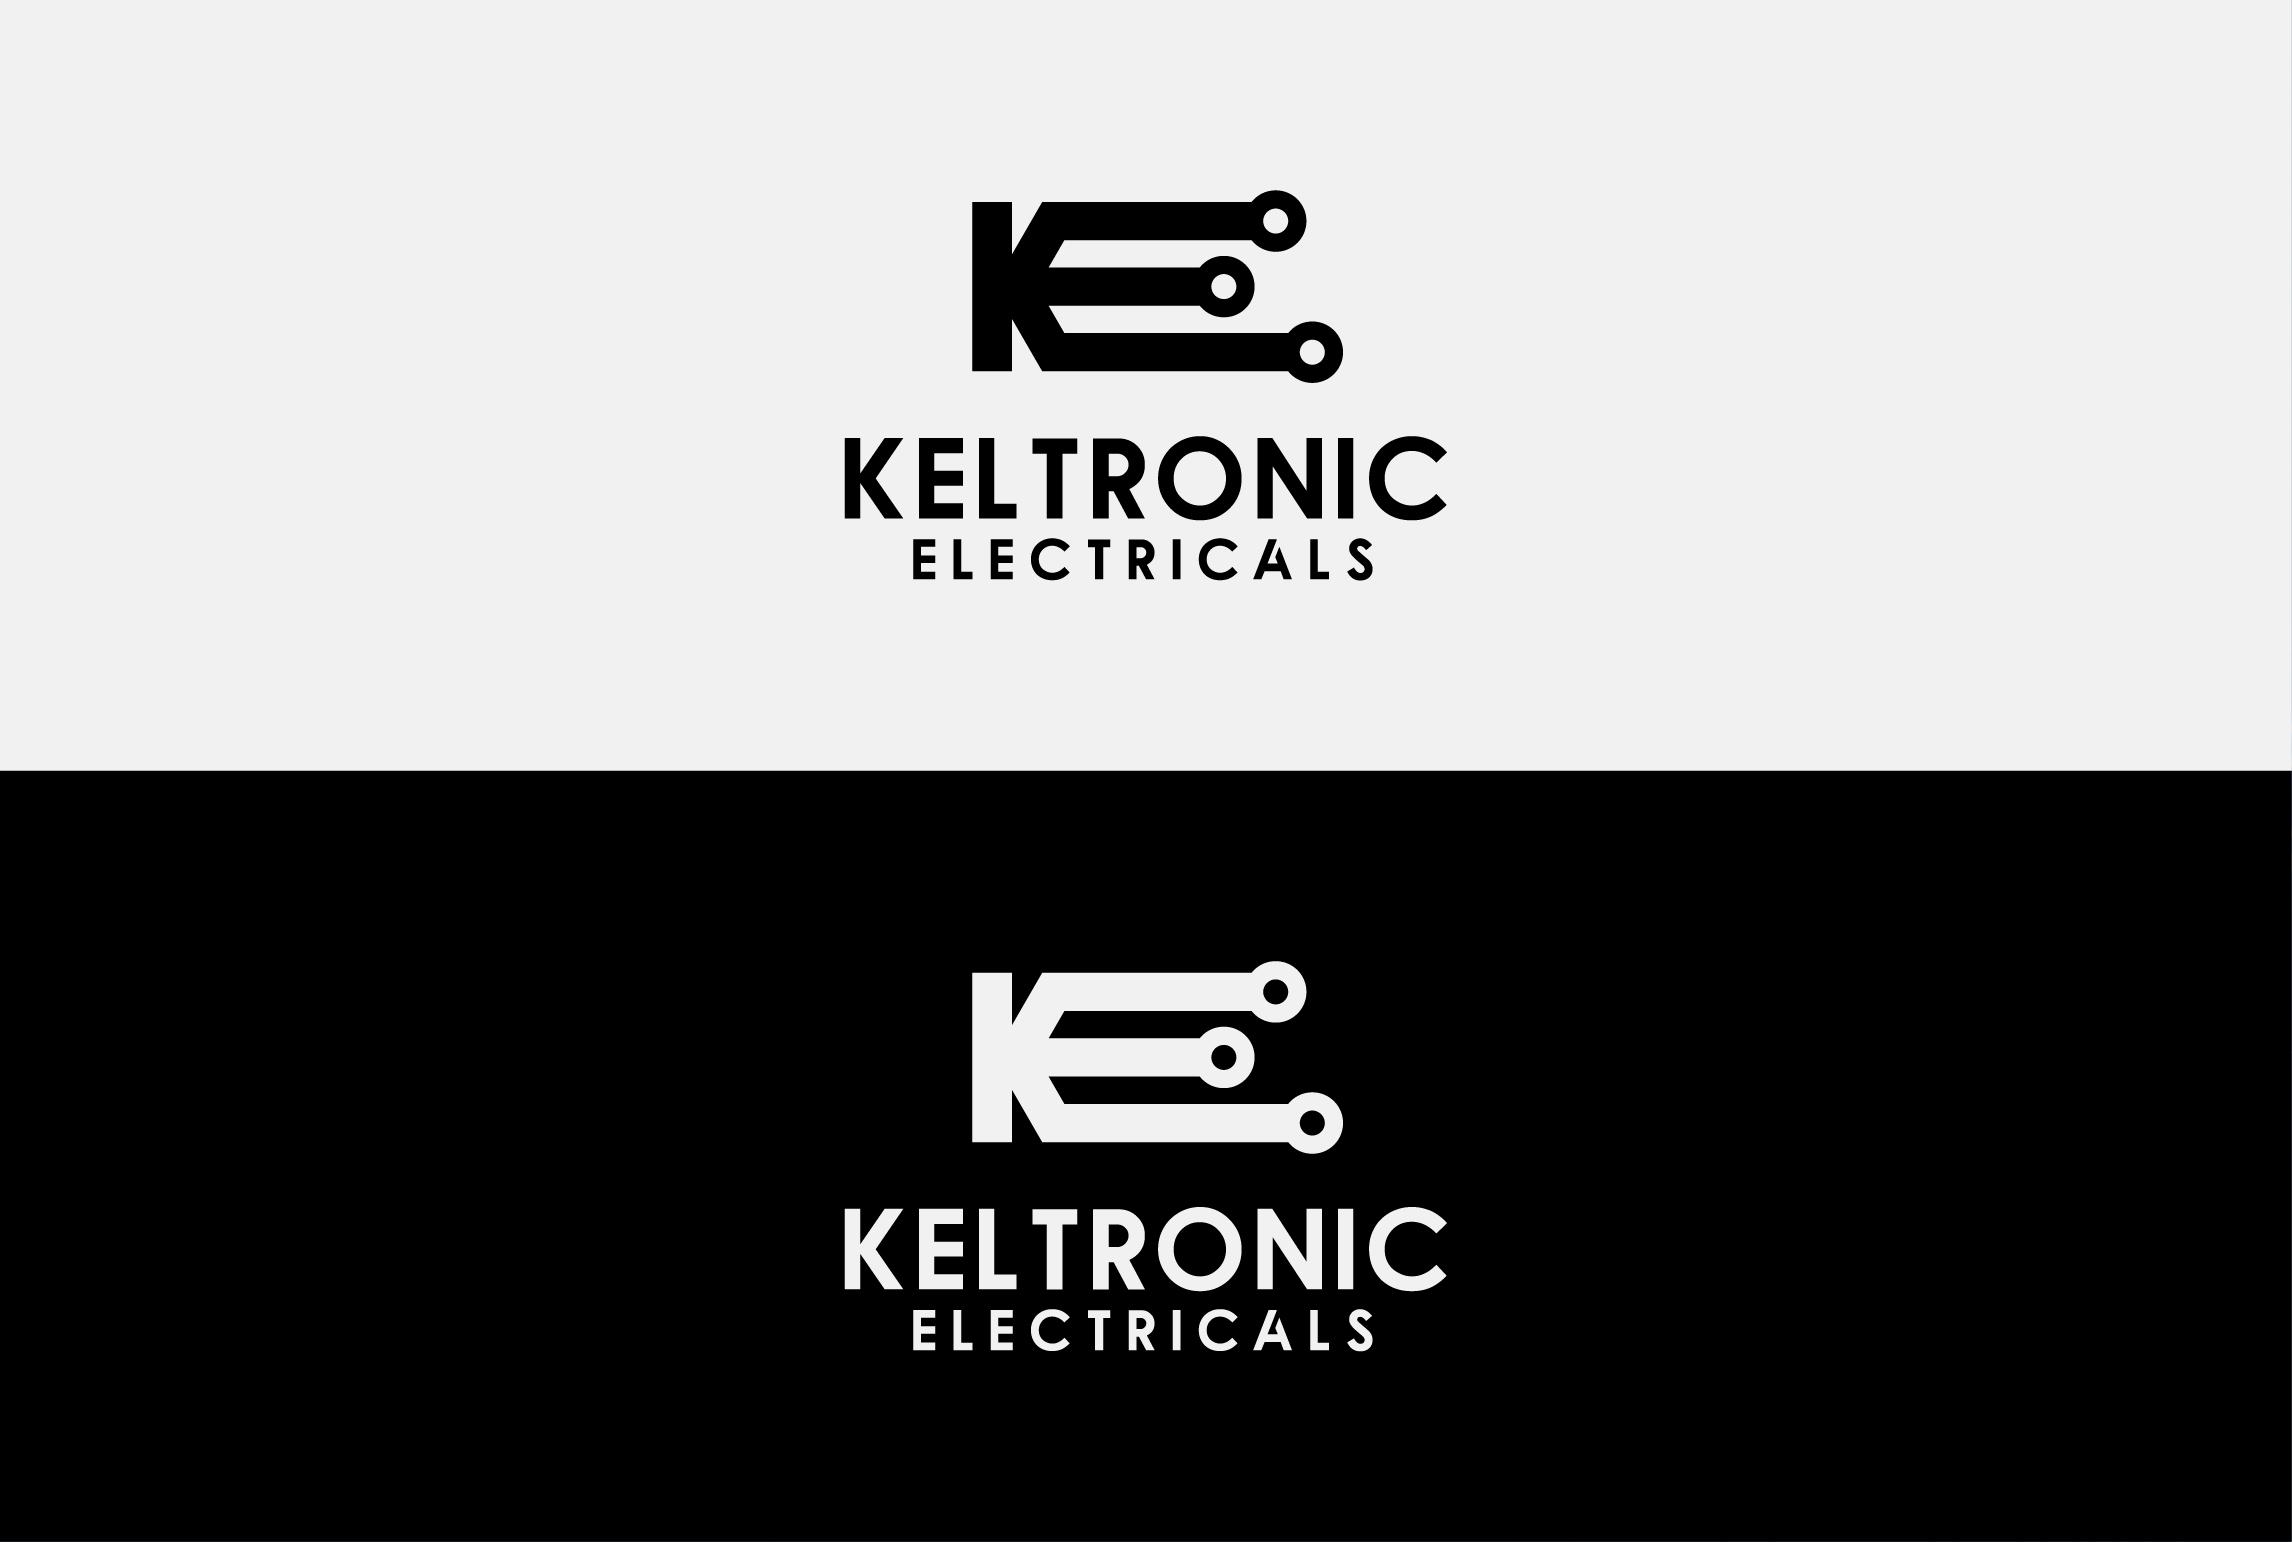 I will do professional minimalist patent quality logo design